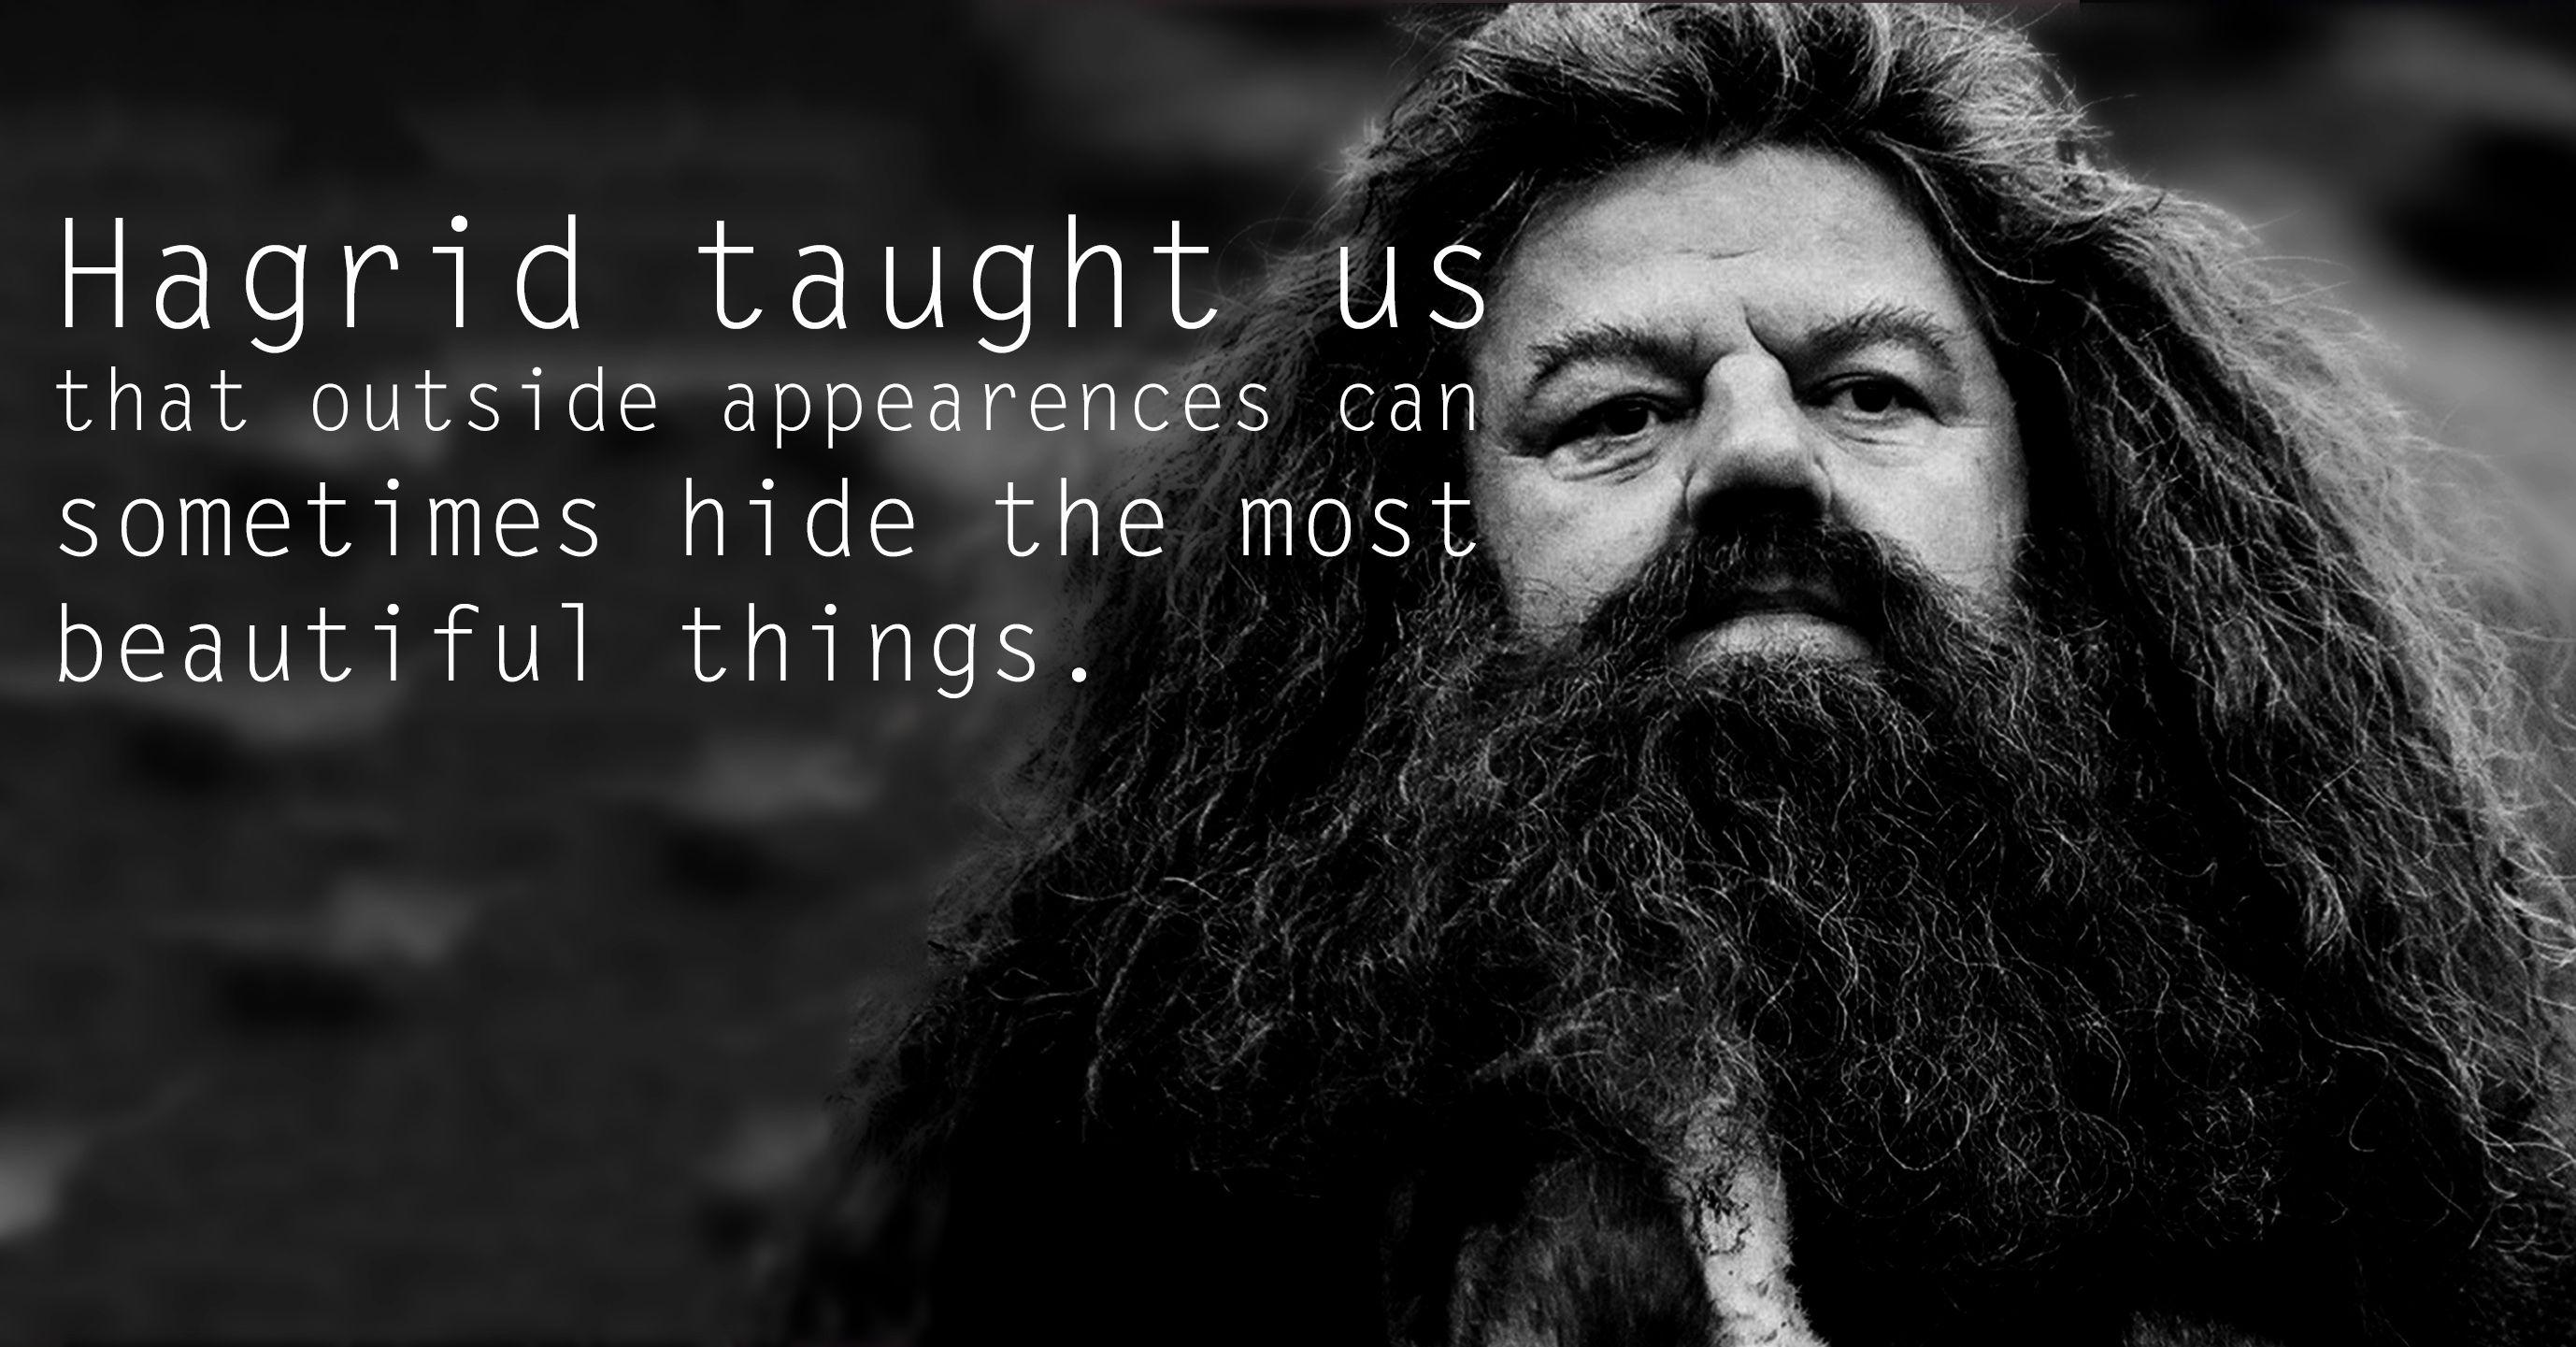 hagrid stuff | hagrid-see-the-30-things-that-harry-potter-taught-us.jpg